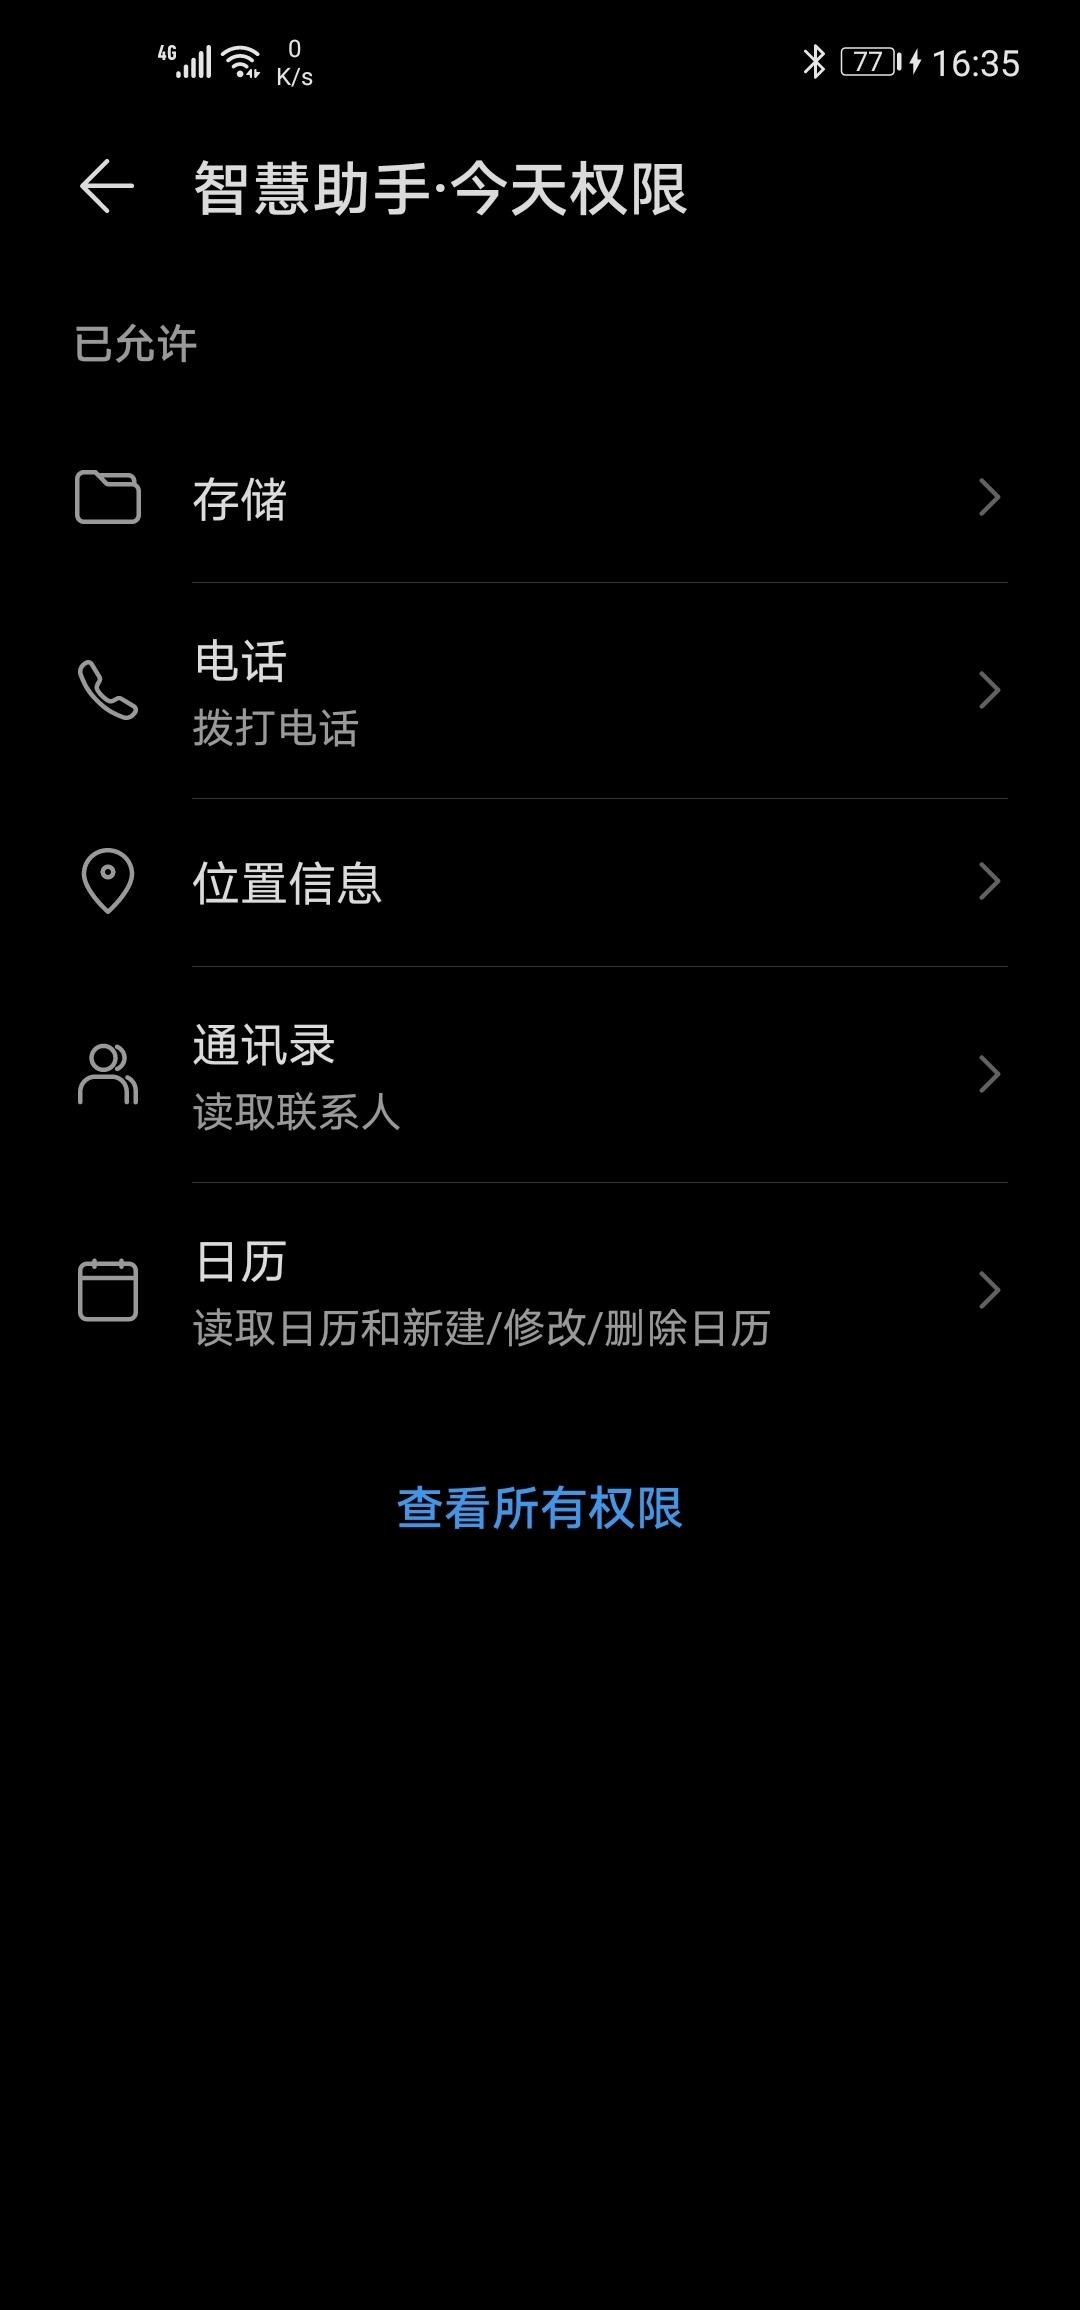 Screenshot_20200517_163541_com.android.permissioncontroller.jpg